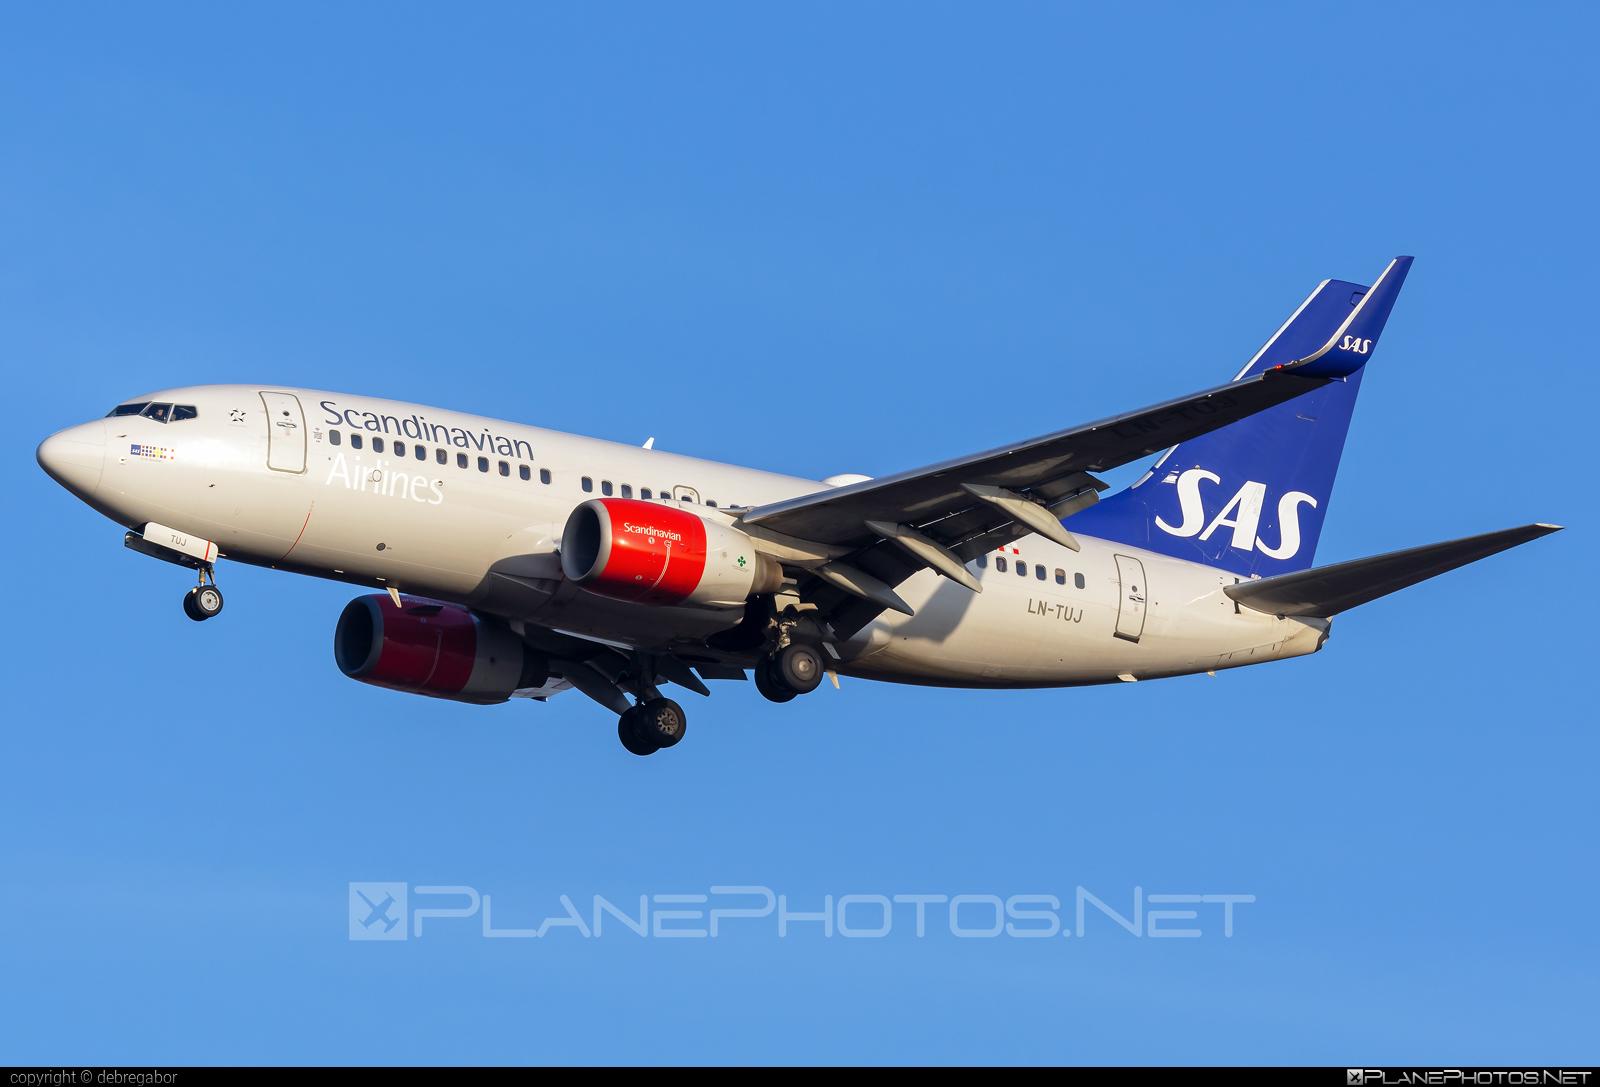 Boeing 737-700 - LN-TUJ operated by Scandinavian Airlines (SAS) #b737 #b737nextgen #b737ng #boeing #boeing737 #sas #sasairlines #scandinavianairlines